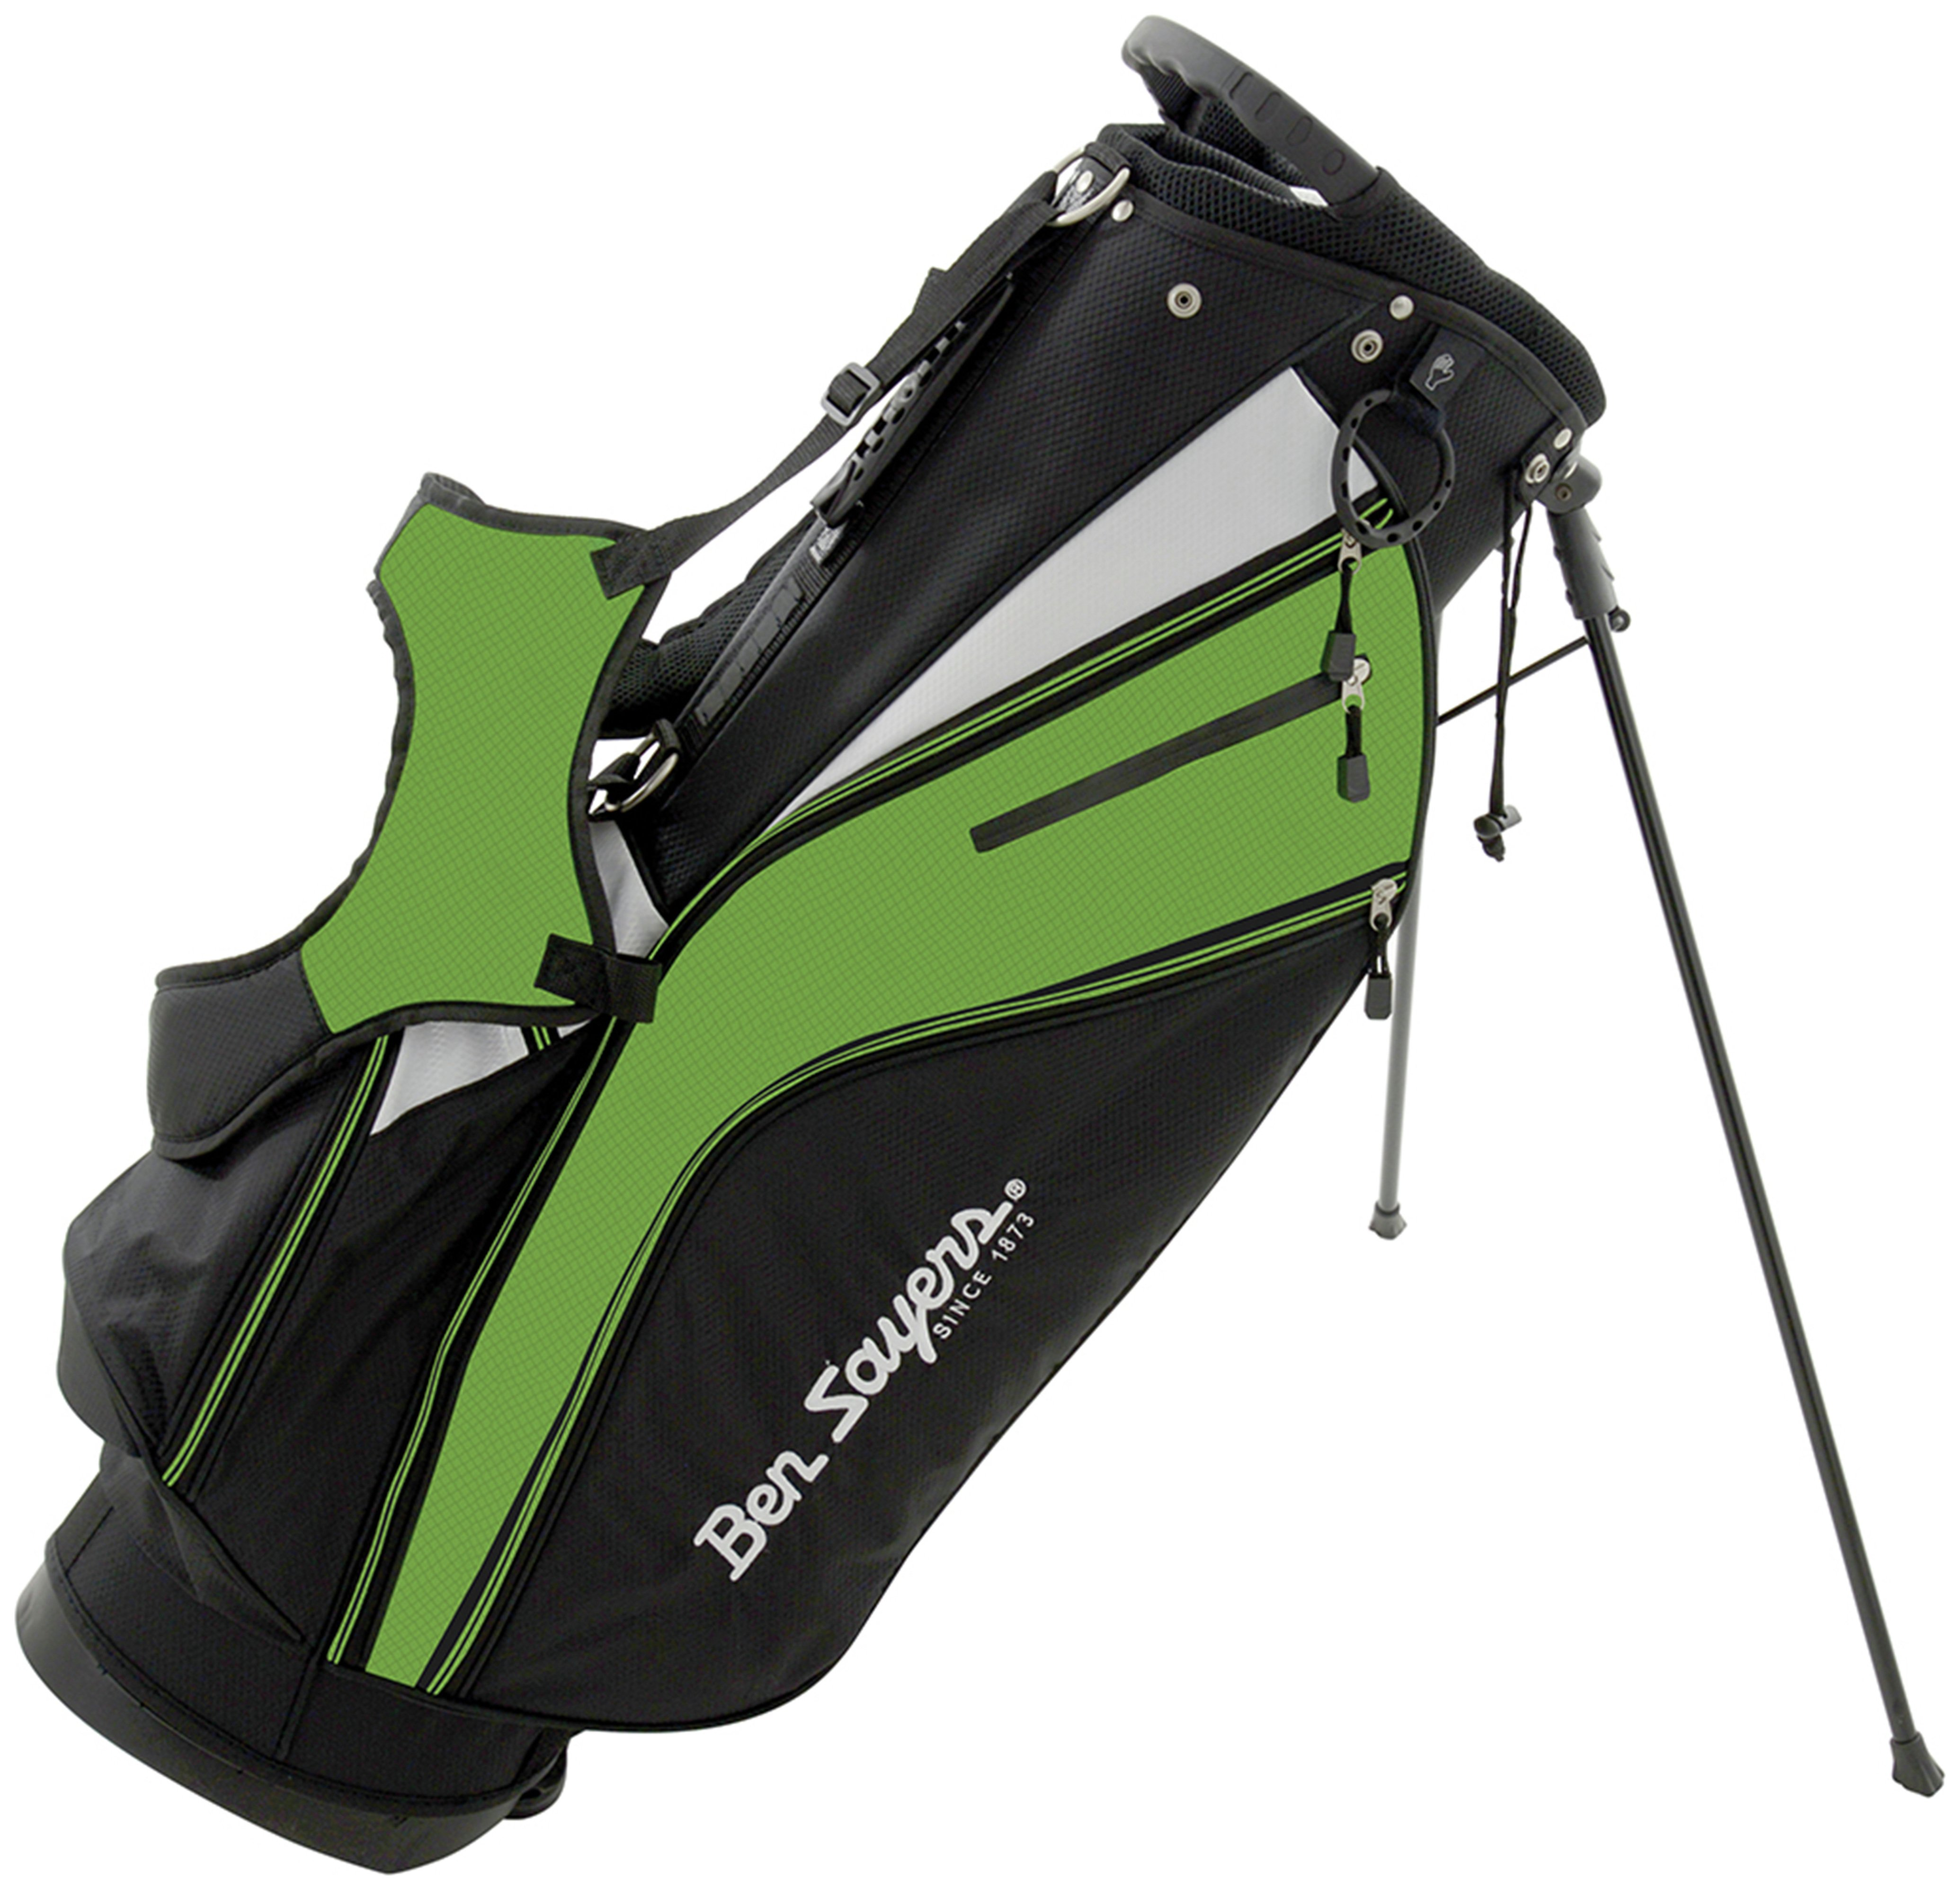 Ben Sayers X-Lite Stand Bag - Black/Lime